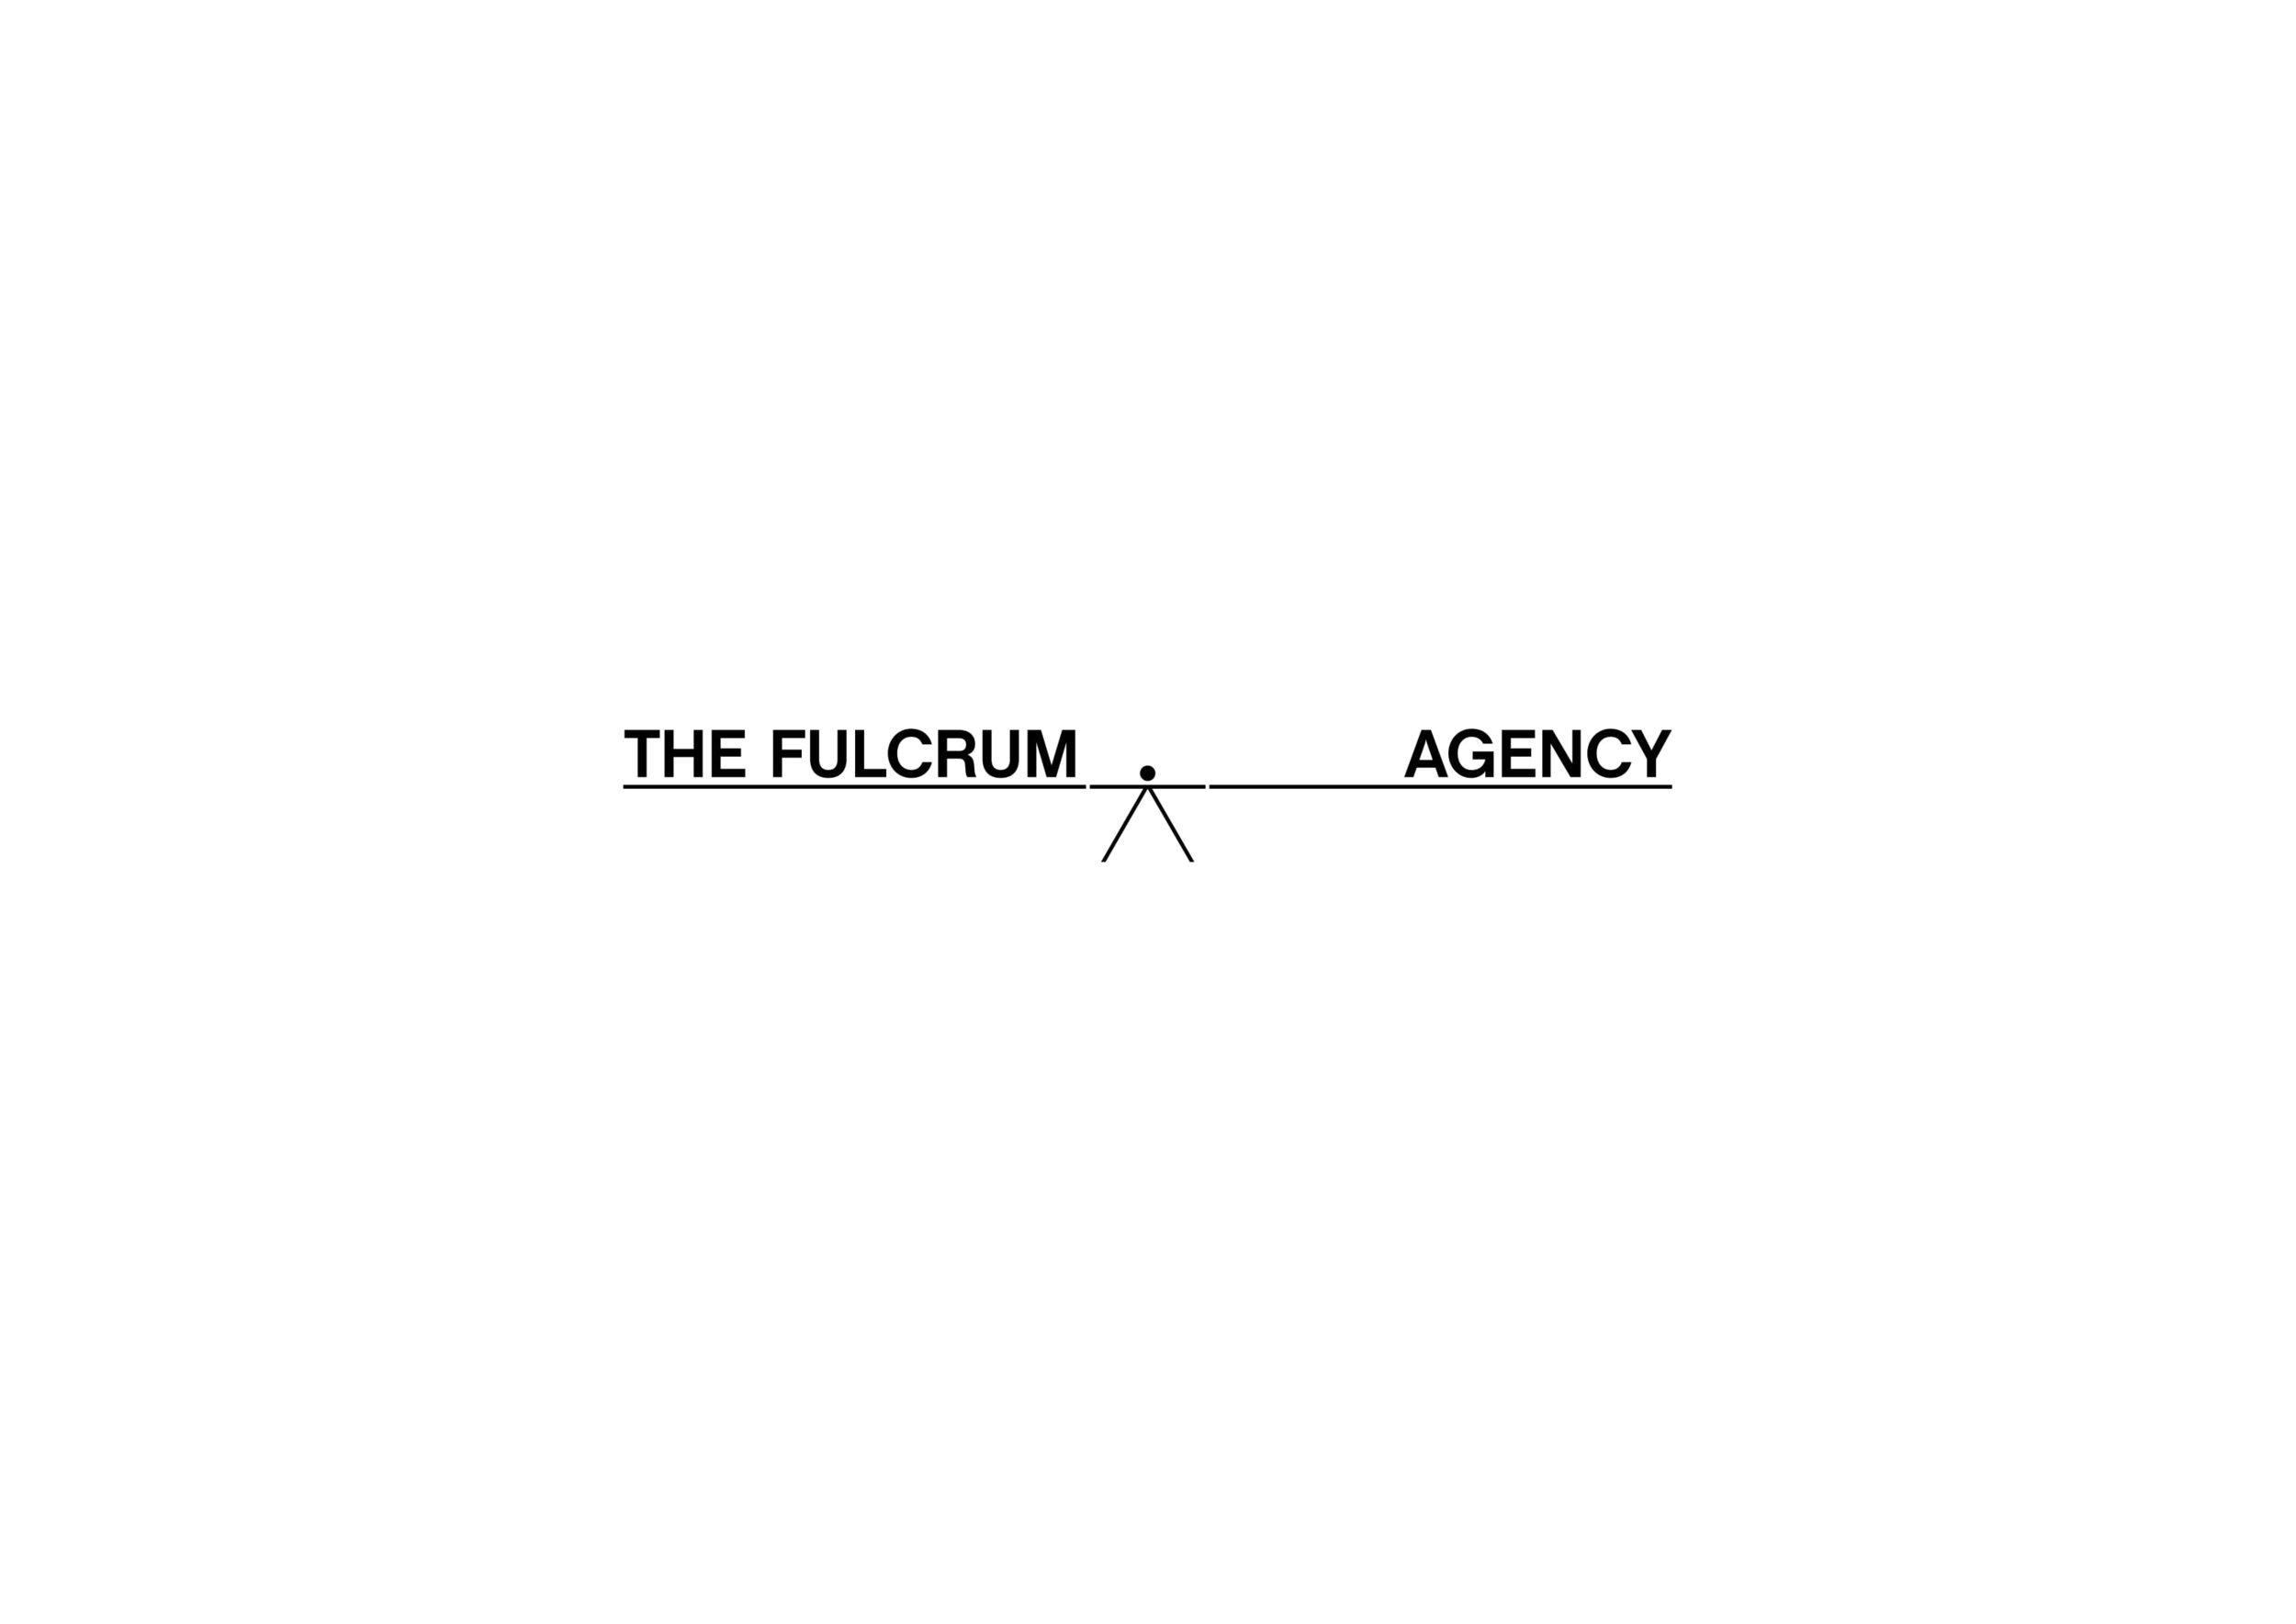 190207 FULCRUM CONCEPT WIP-48.jpg